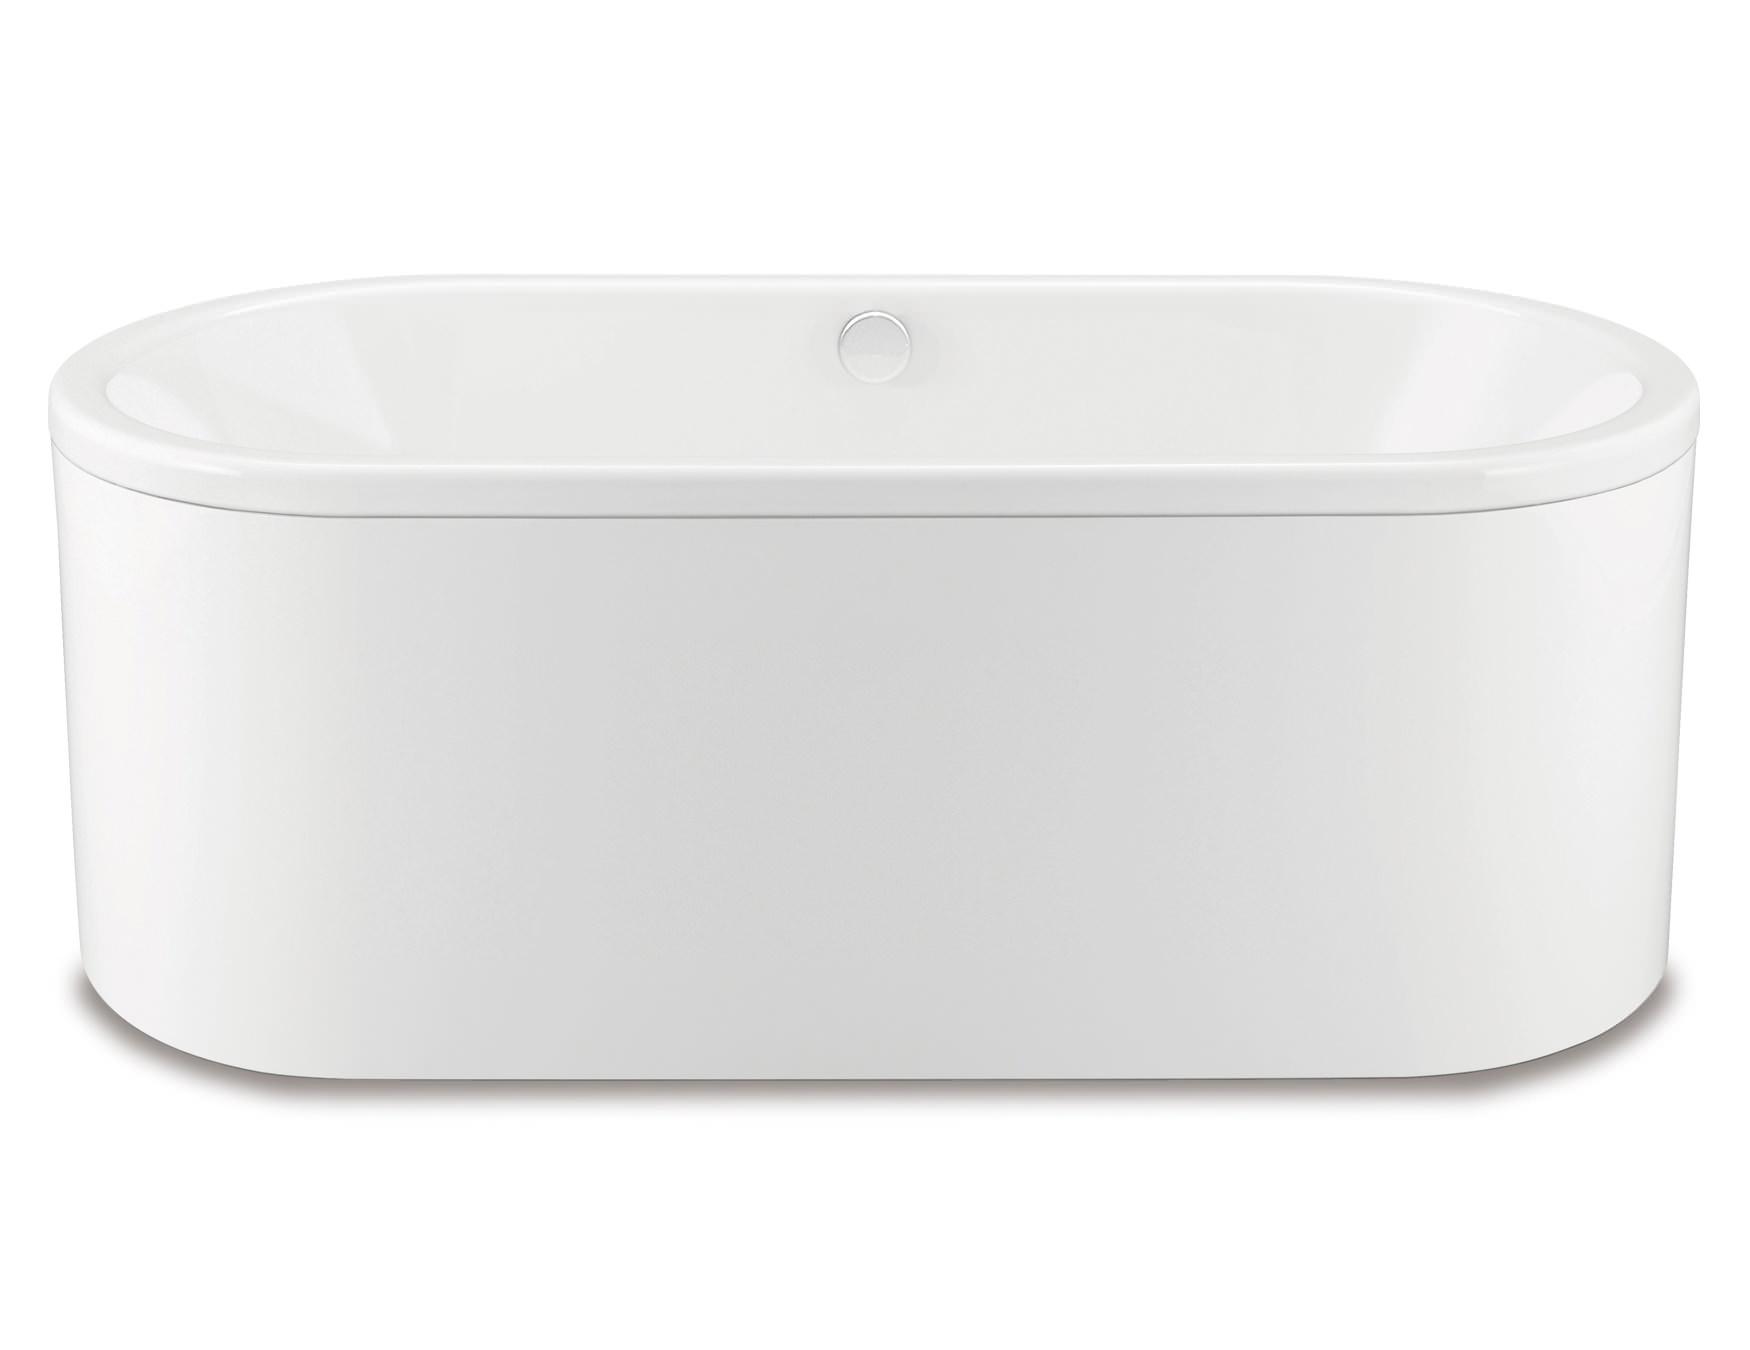 kaldewei centro duo 128 7 oval steel bath 1800 x 800mm. Black Bedroom Furniture Sets. Home Design Ideas